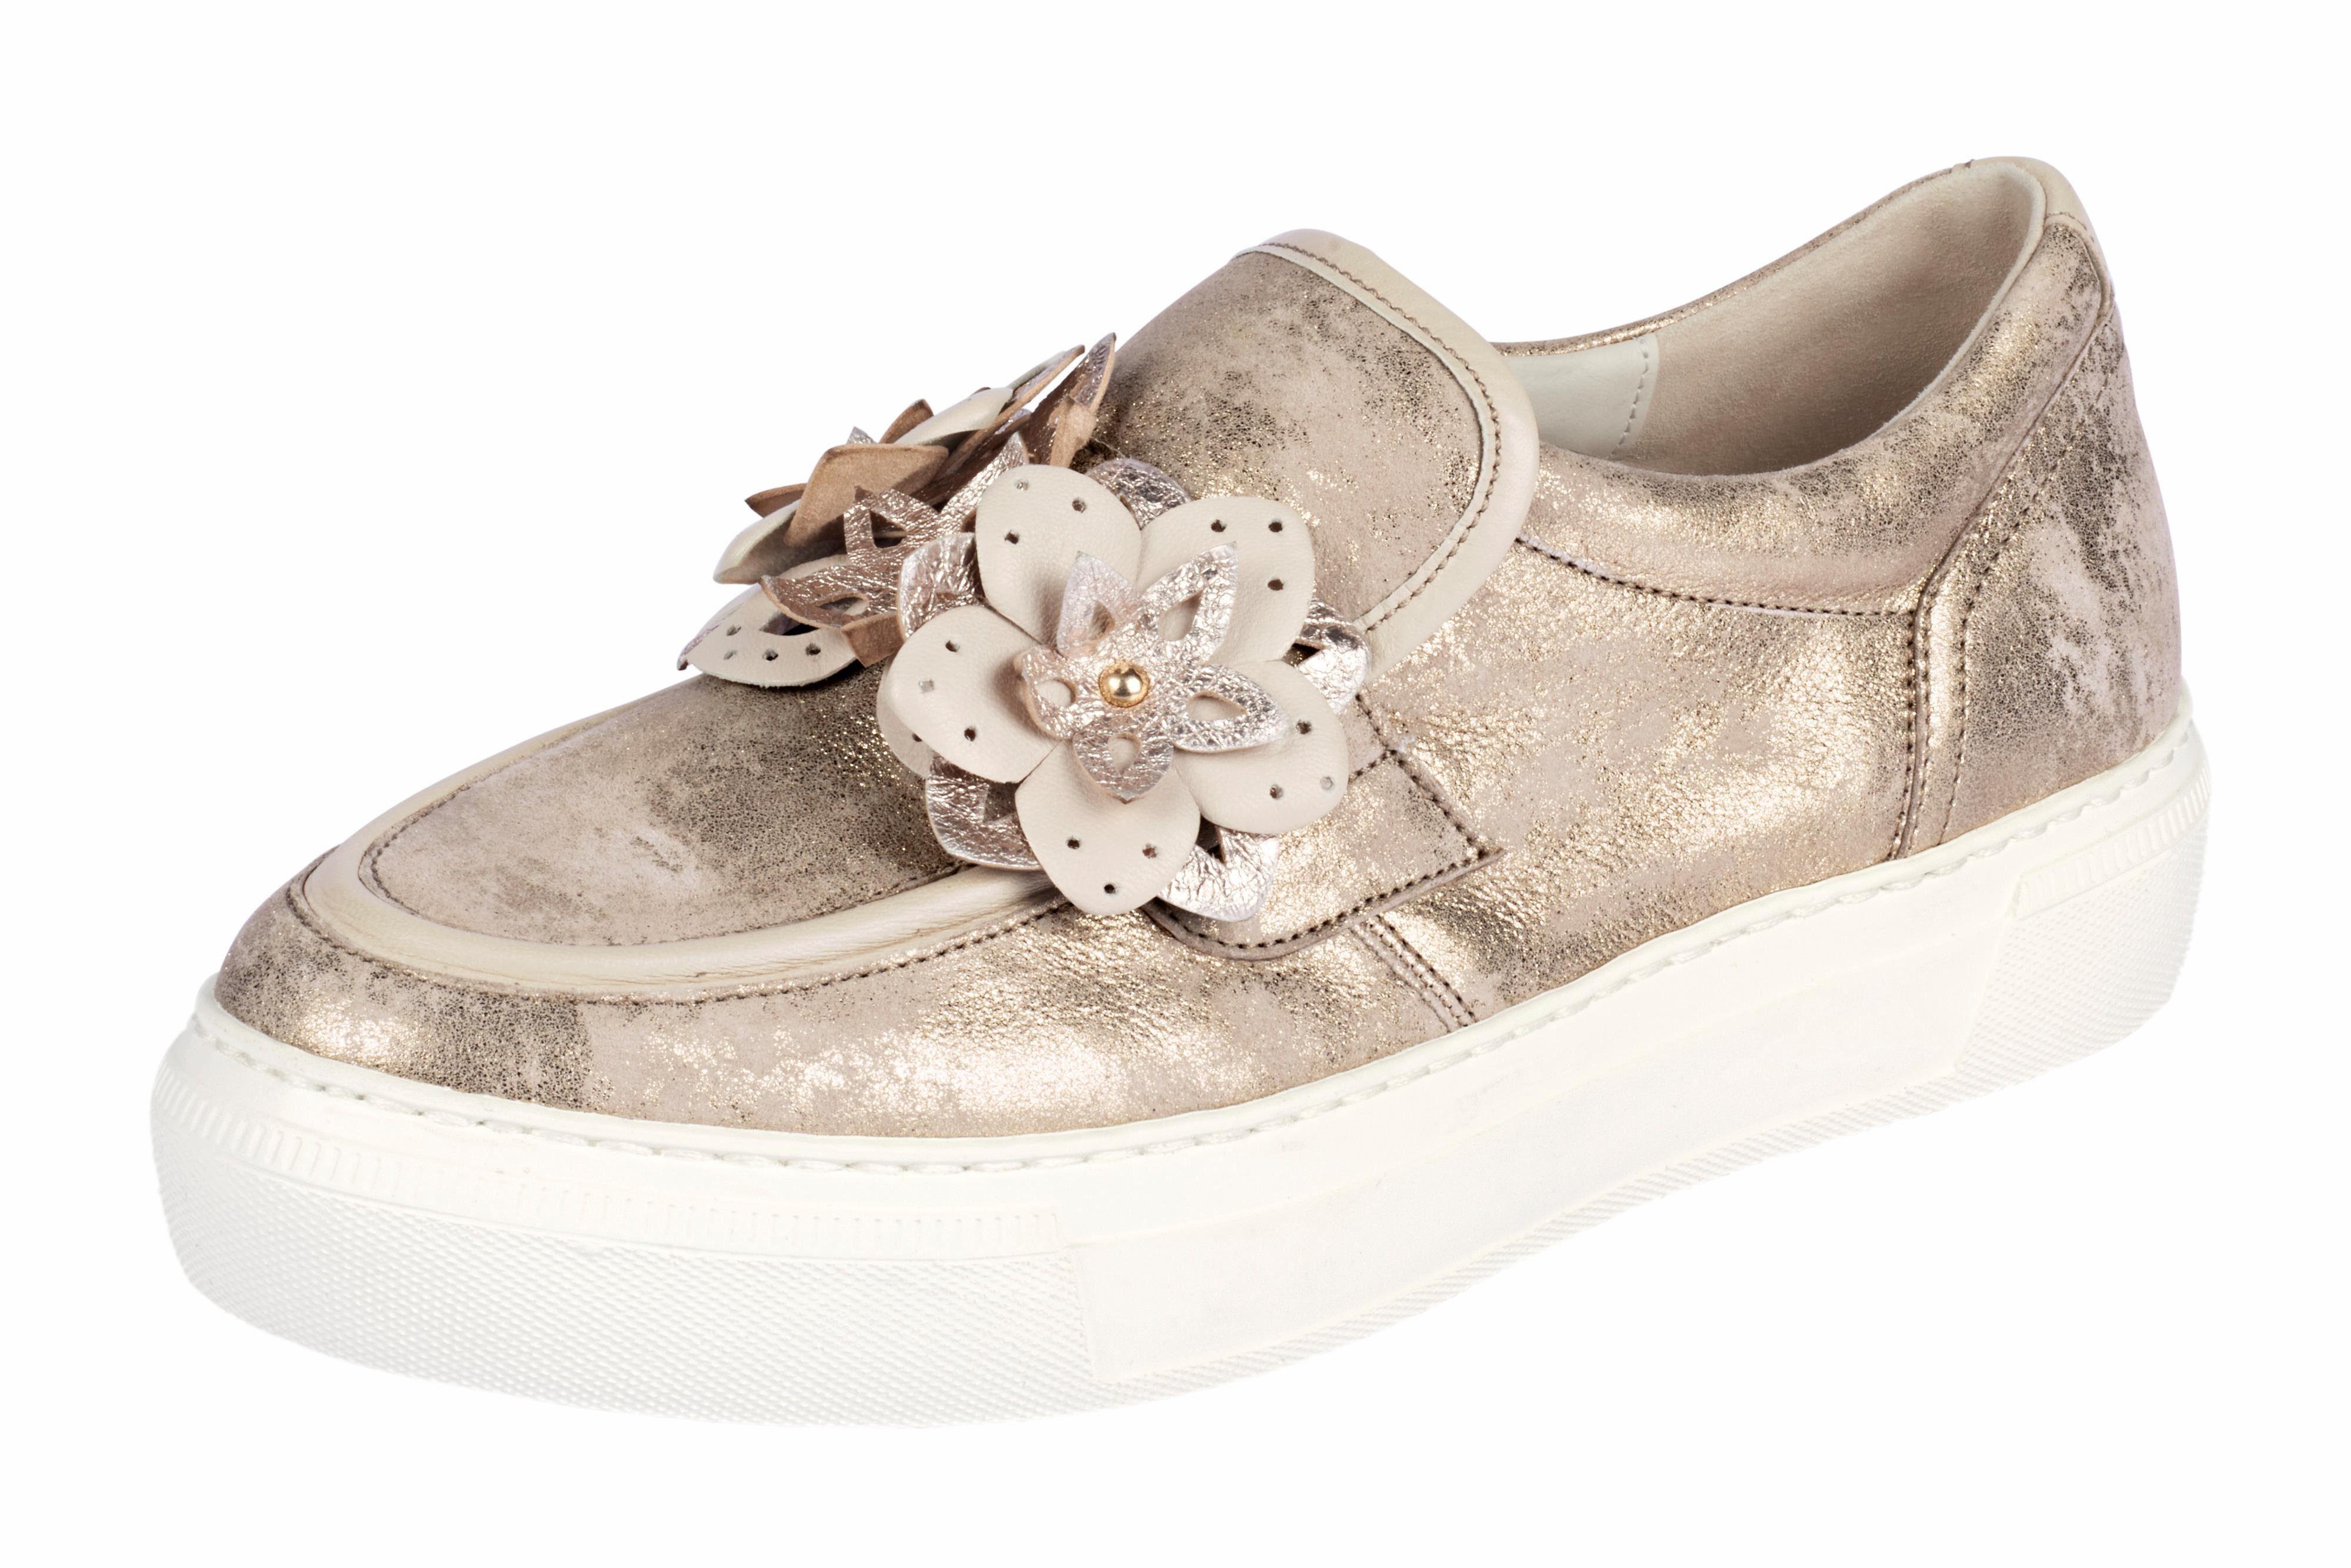 Boutique &5668 GABOR GABOR &5668 Slipper mit Blütenapplikation e68345